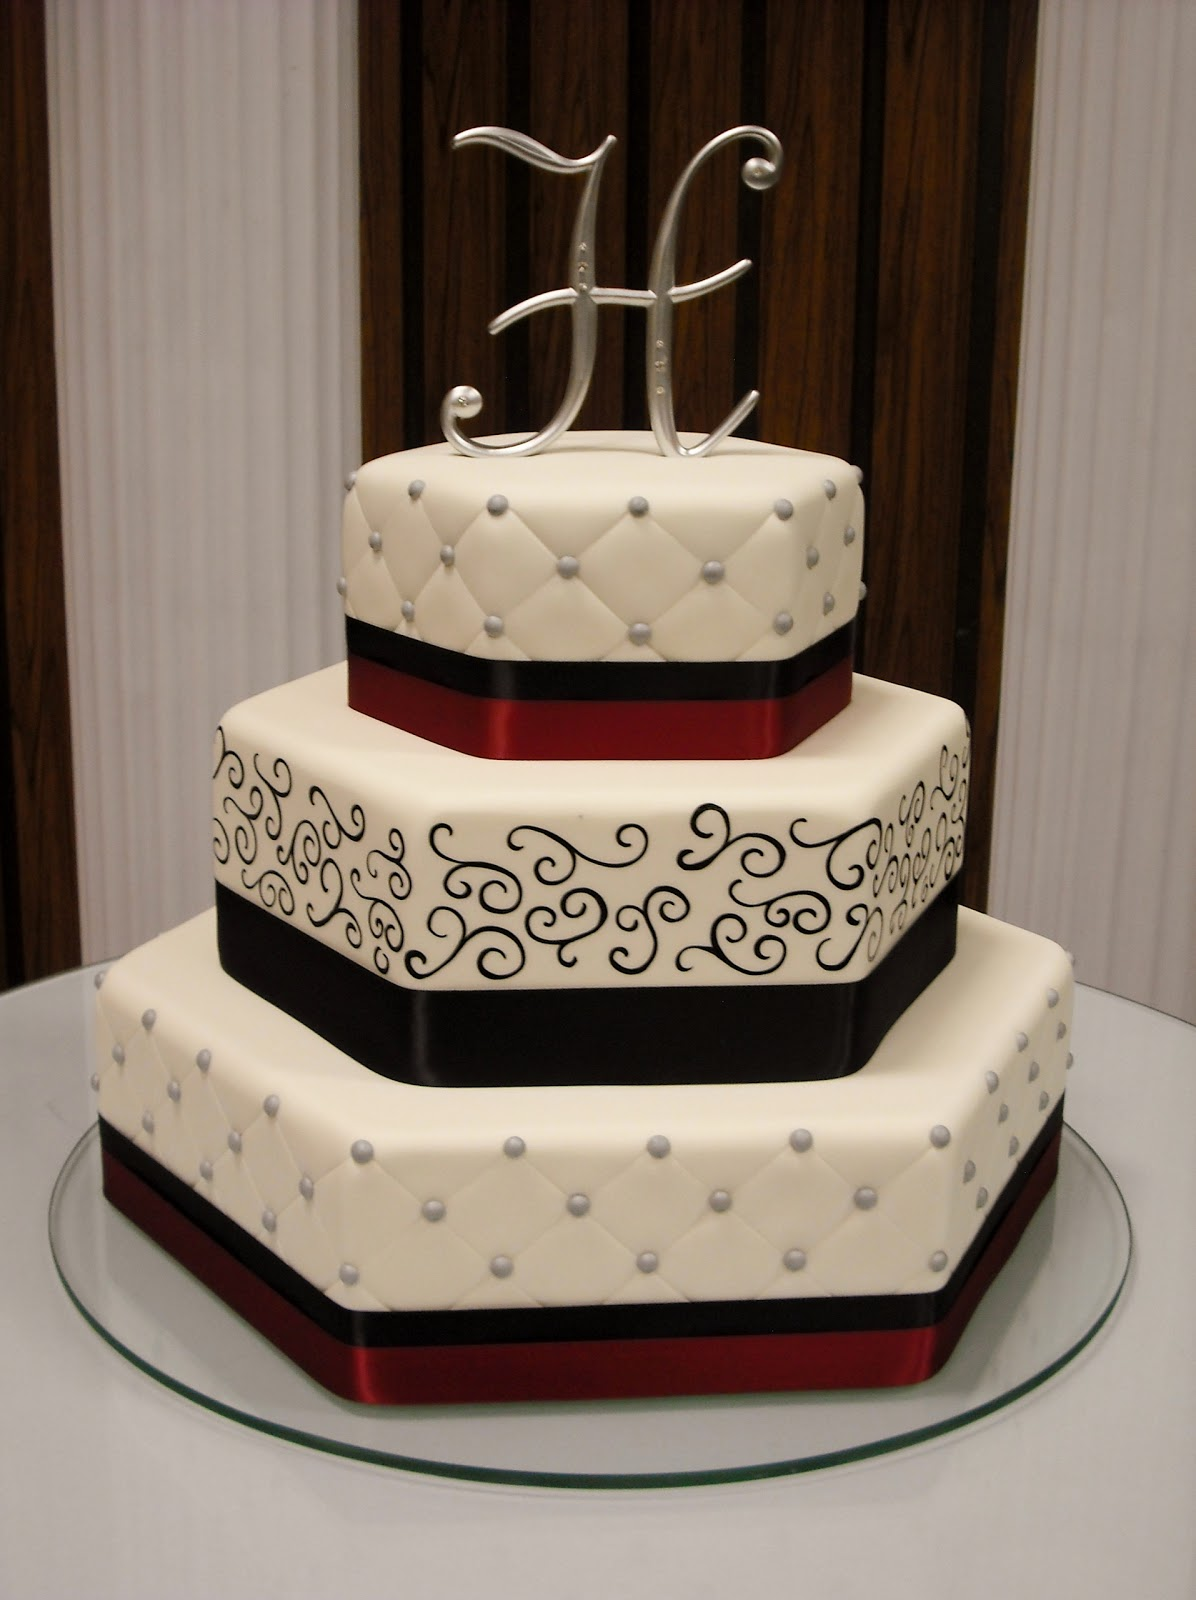 Hexagon Cake Servings